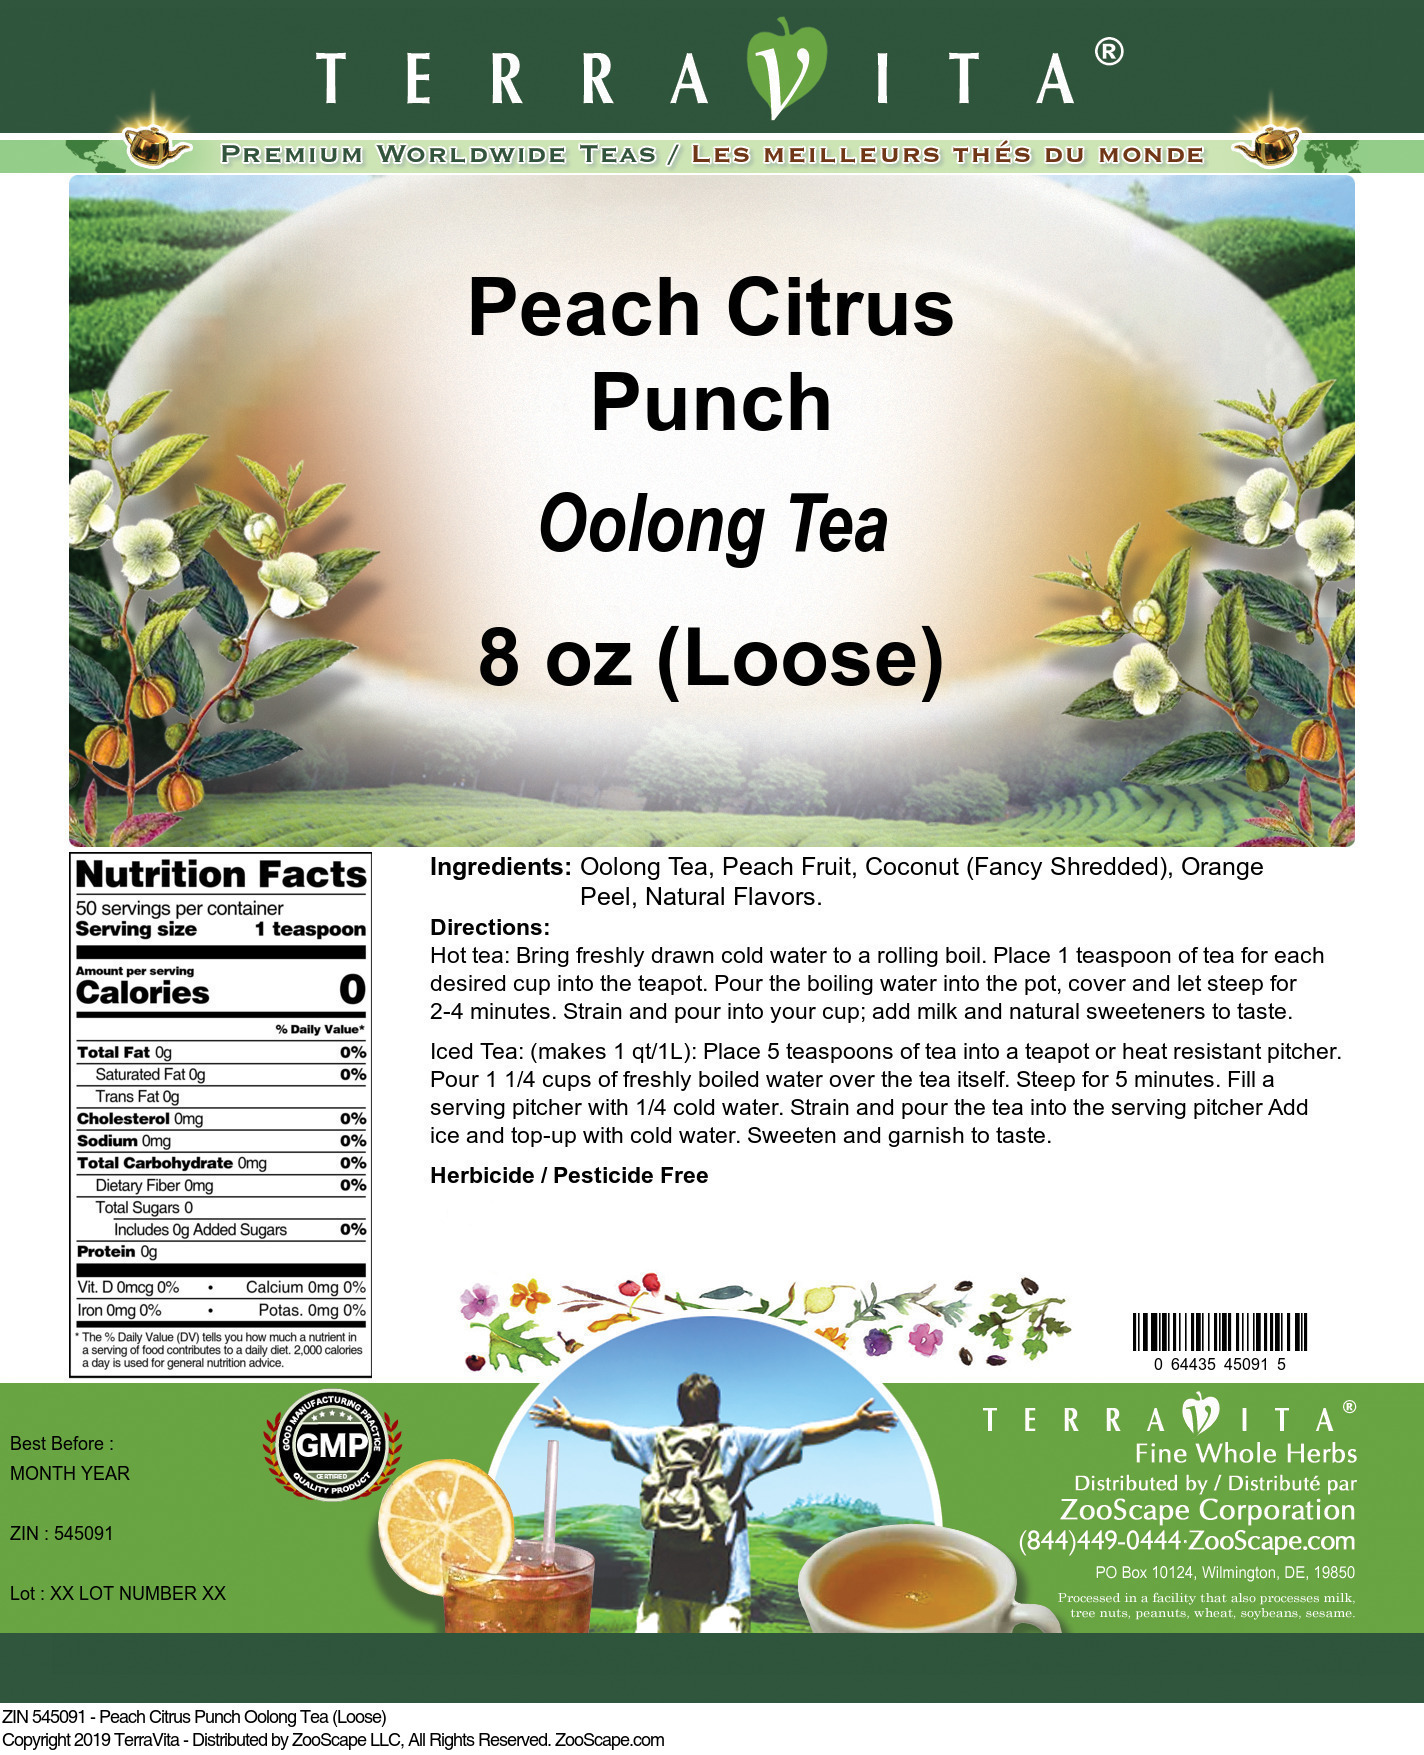 Peach Citrus Punch Oolong Tea (Loose)